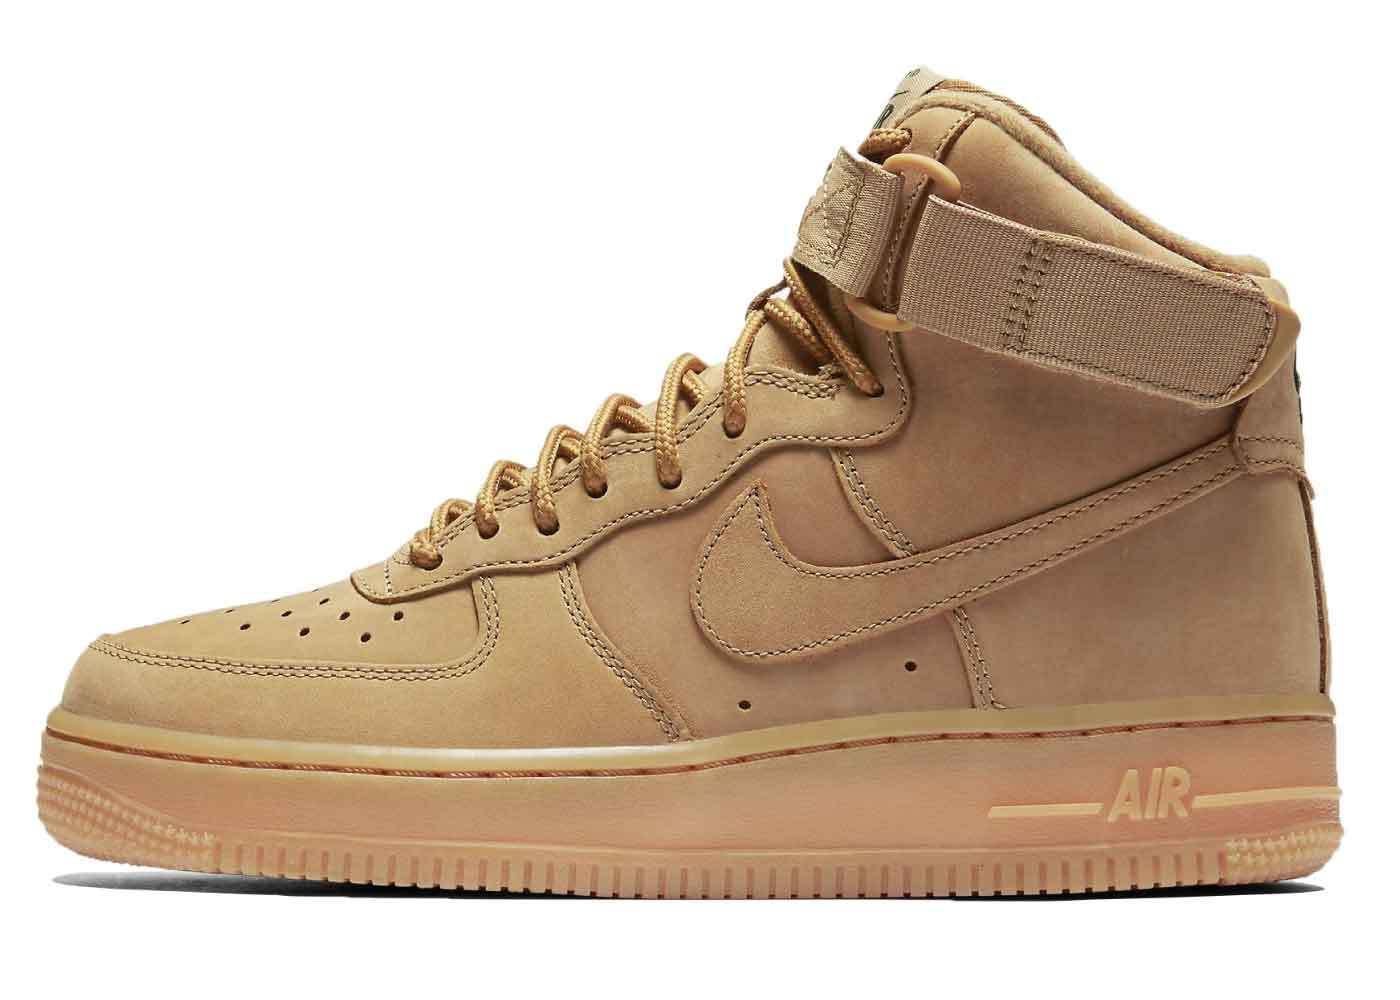 Nike Air Force 1 High Wheat Womens 2016